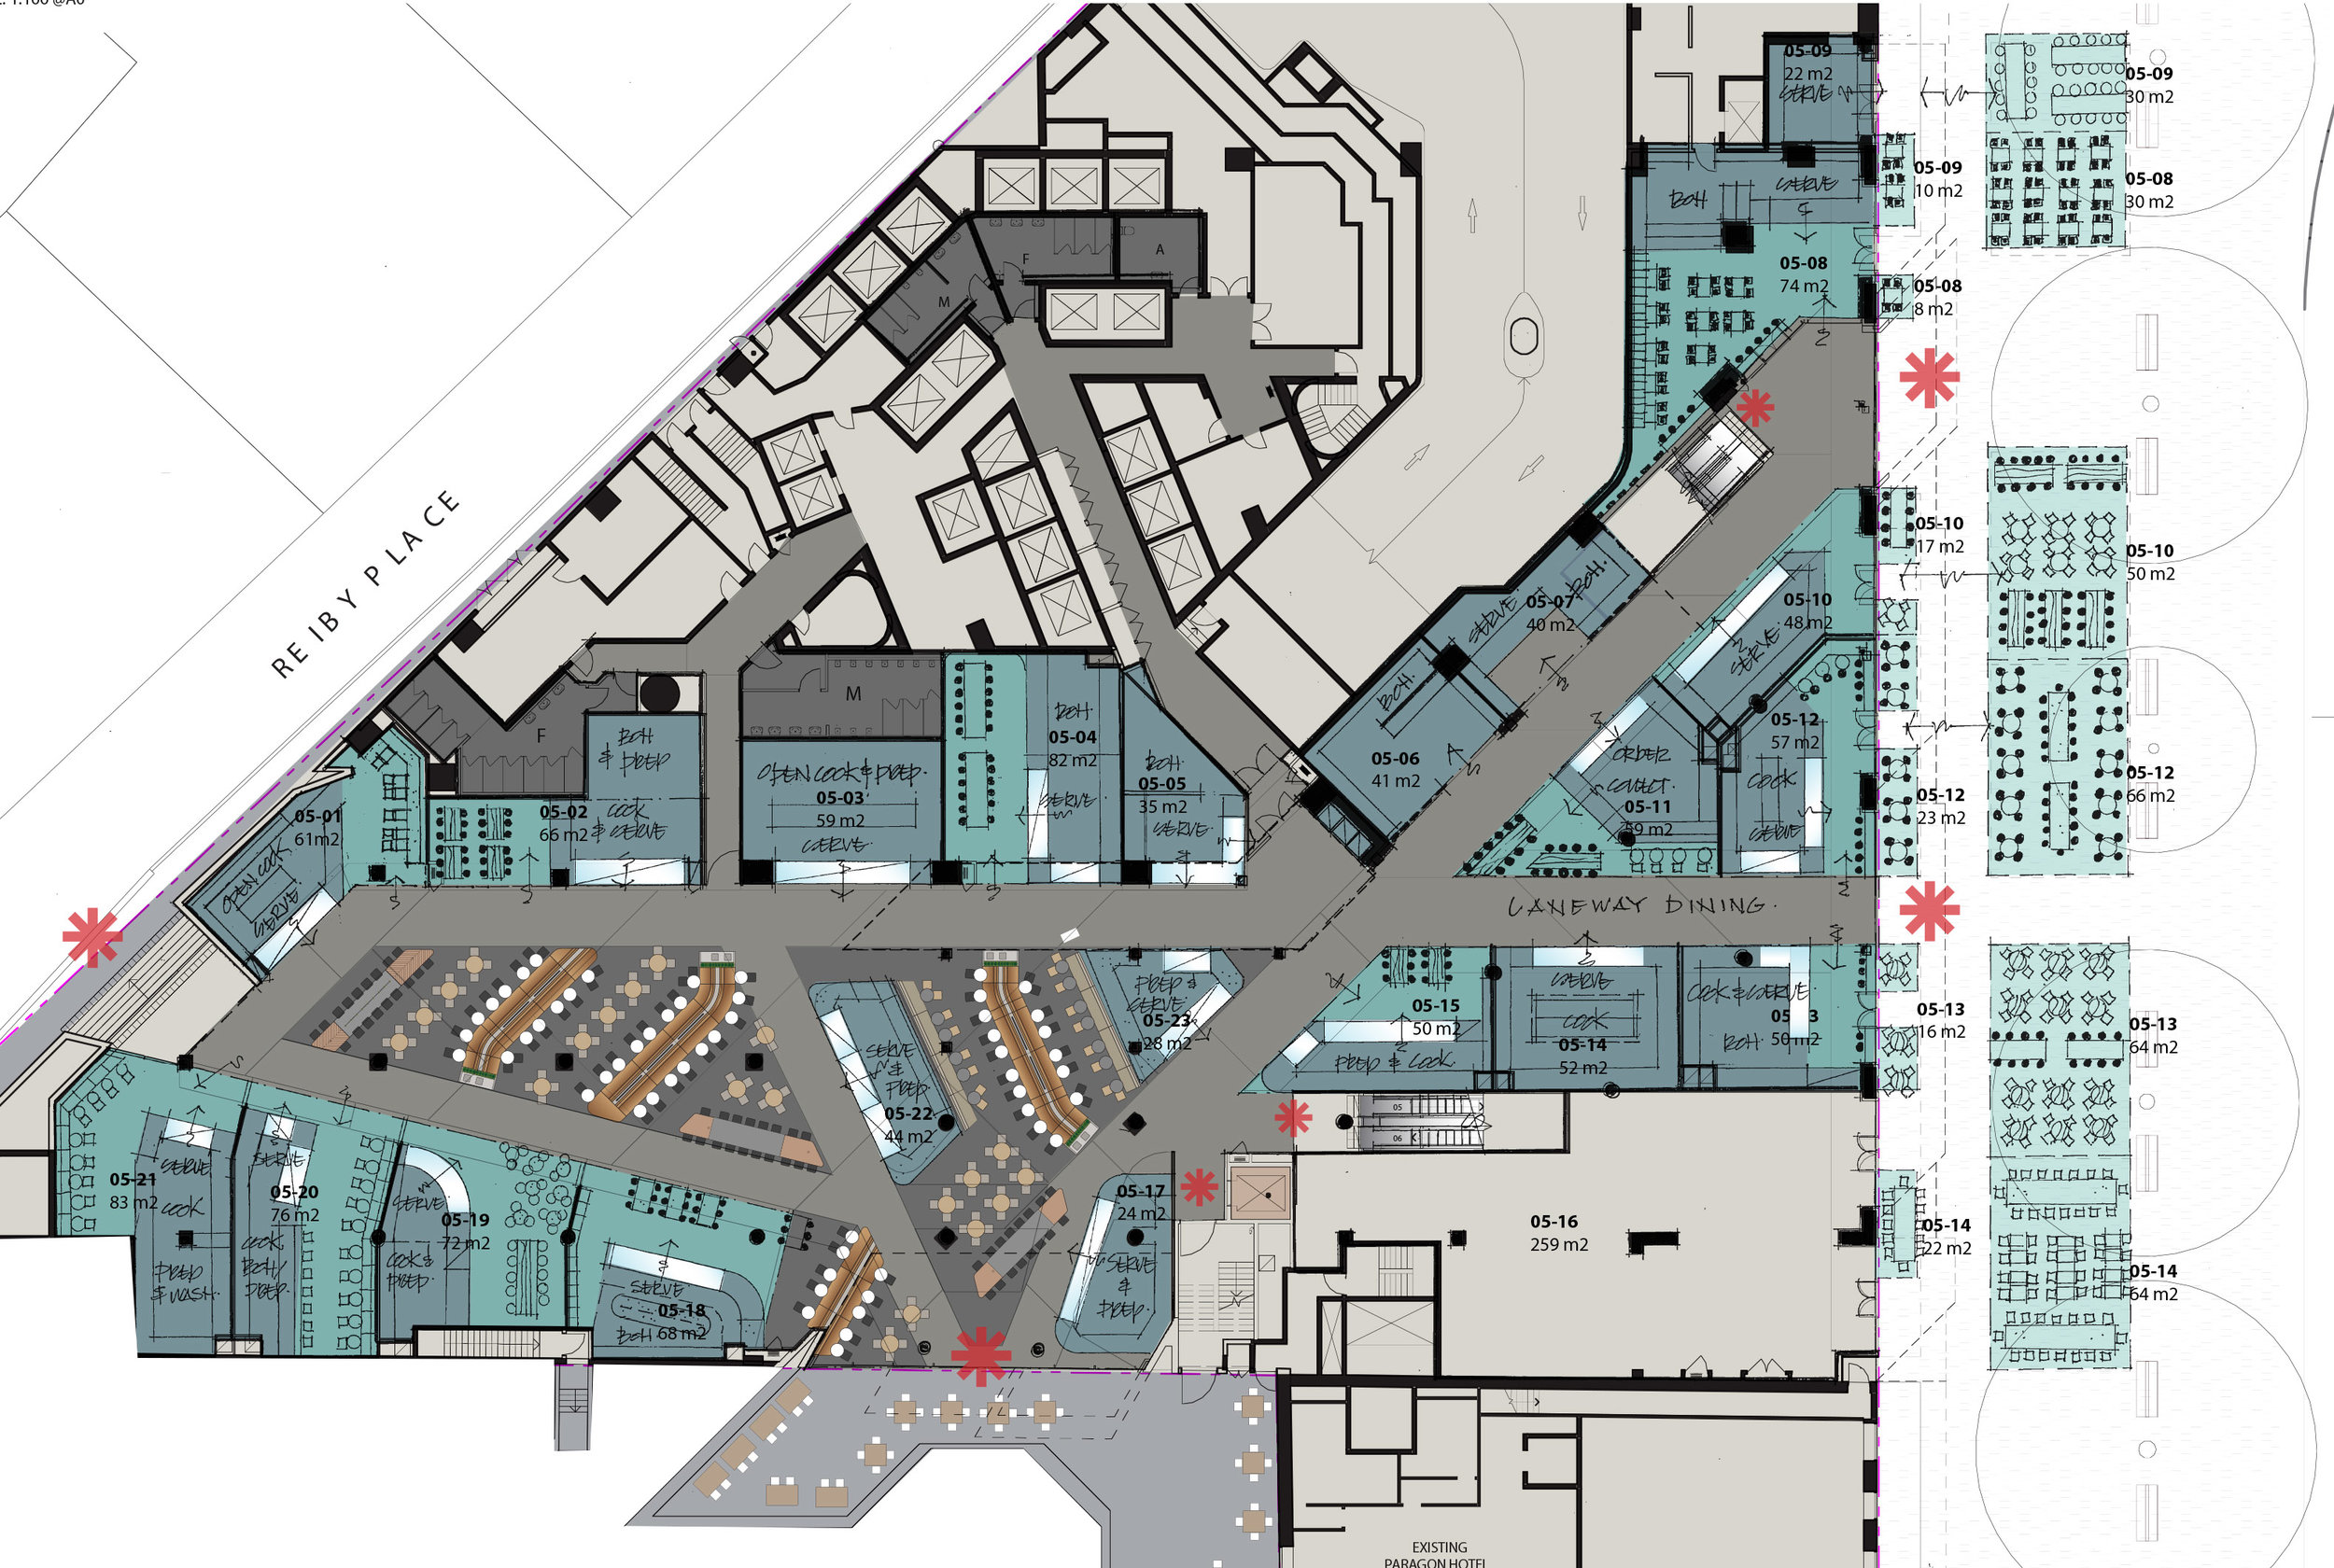 MTRDC Gateway Dining Concept Plan.jpg